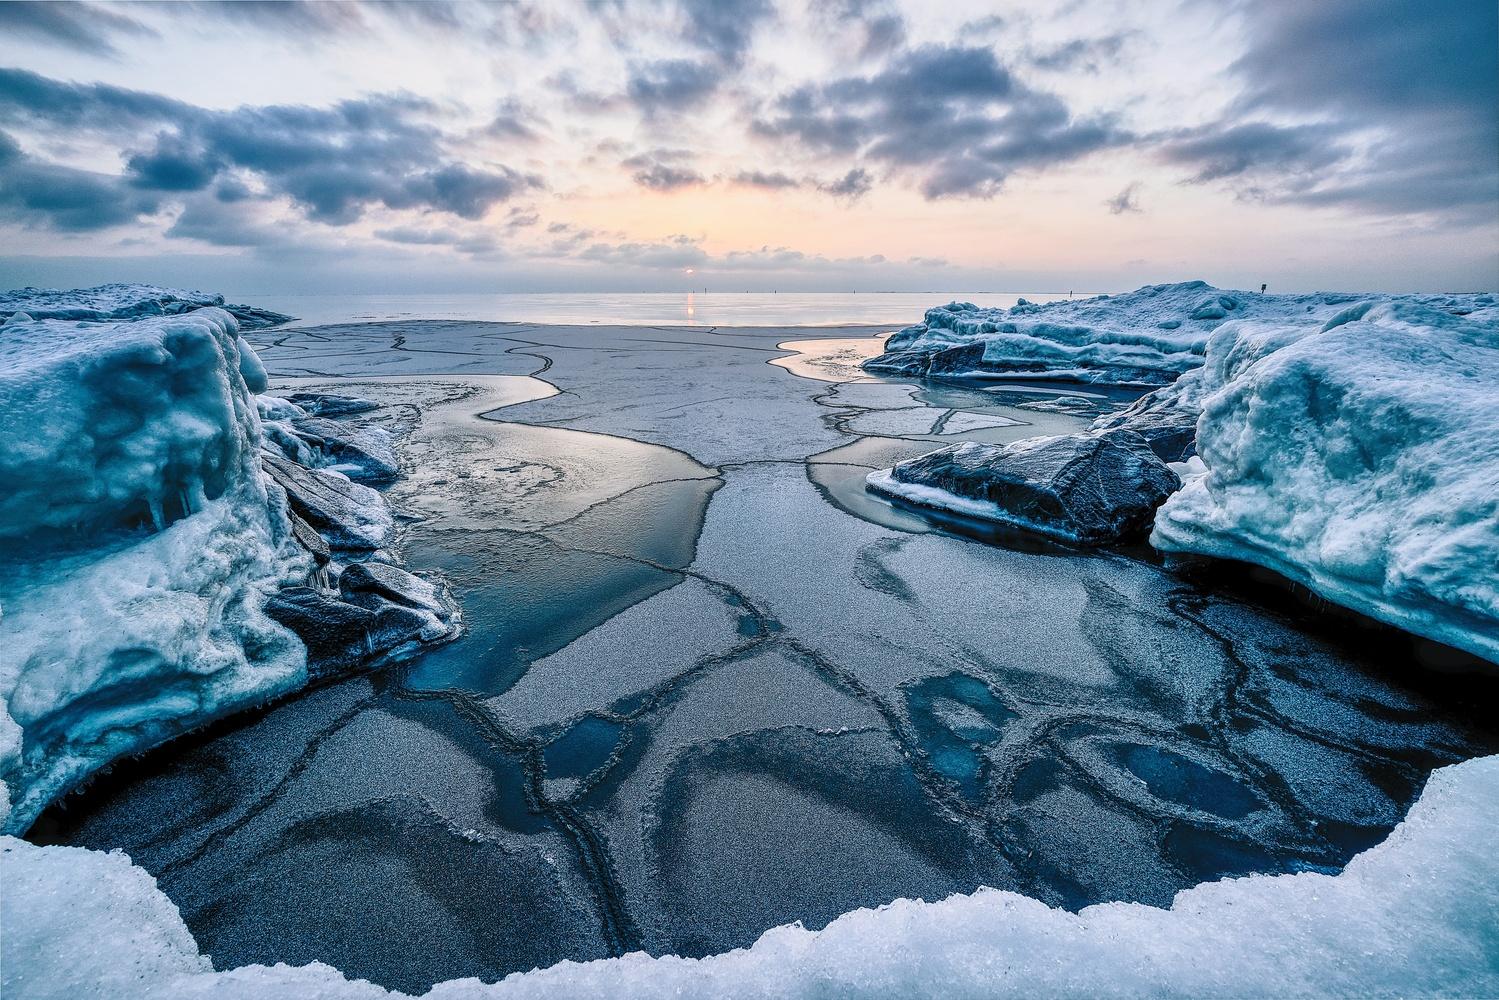 Frozen Shore by Mika Kallio